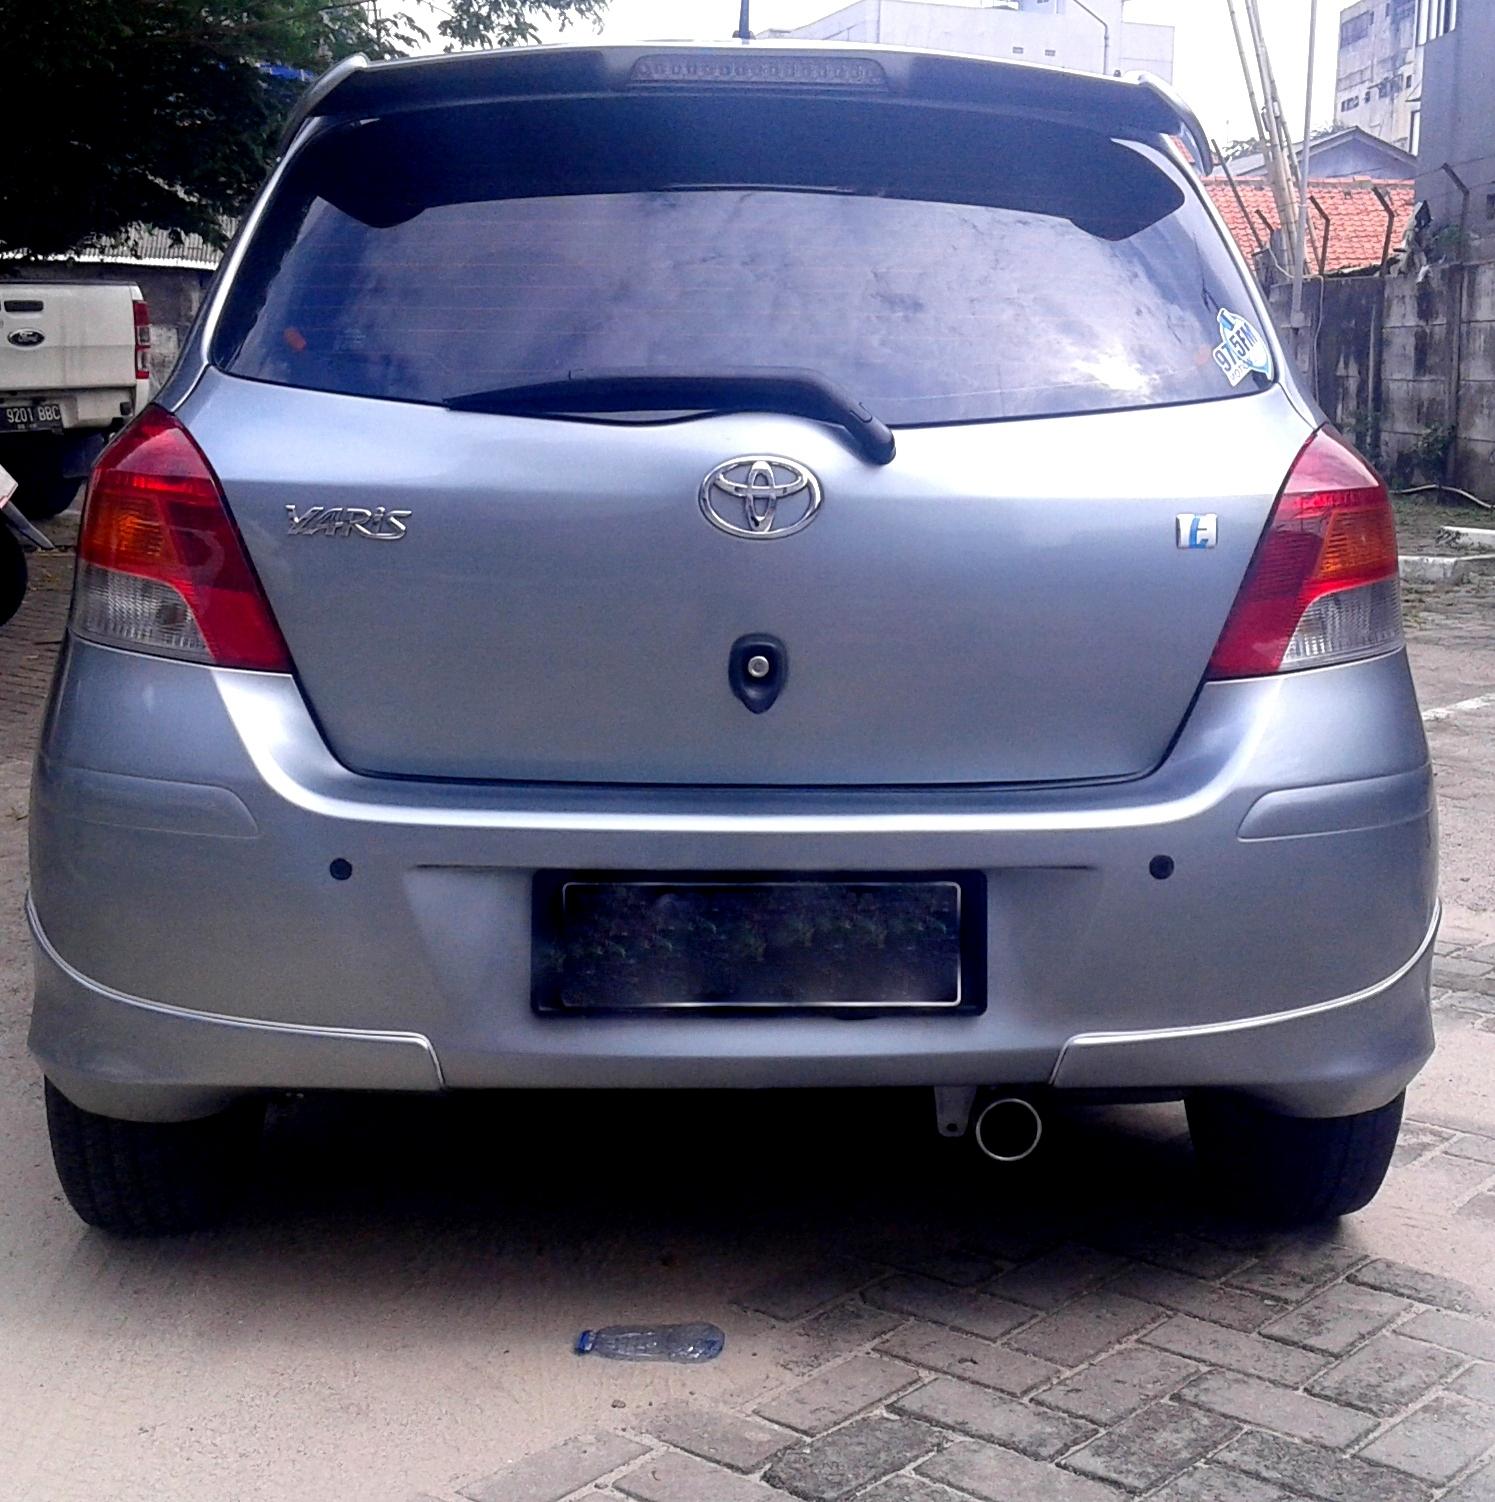 Toyota Yaris Trd Matic All New Camry Thailand Gadai24 Dijual Cepat E 2010 Silver